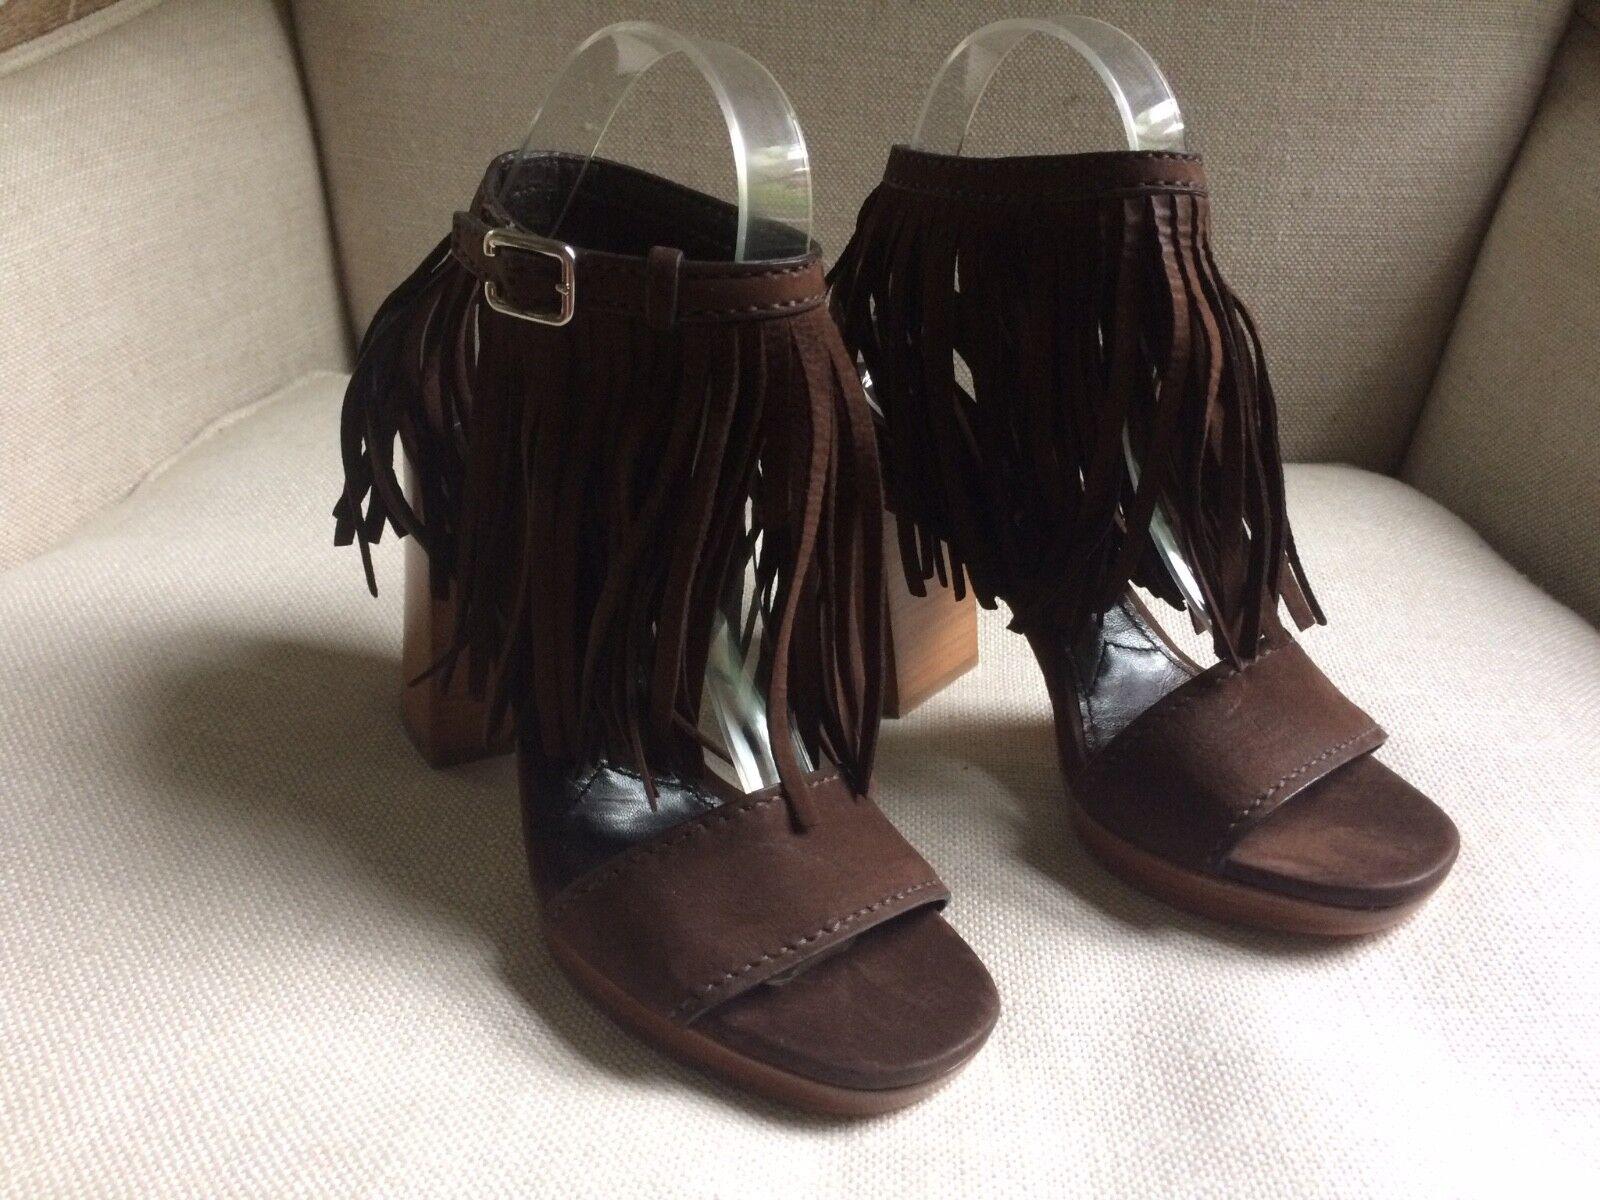 Prada Sandals Sandals Sandals bspringaaa Fringaae mocka Ankle Strap Block klackar Boho EU 36 US 6, NEW  bara för dig